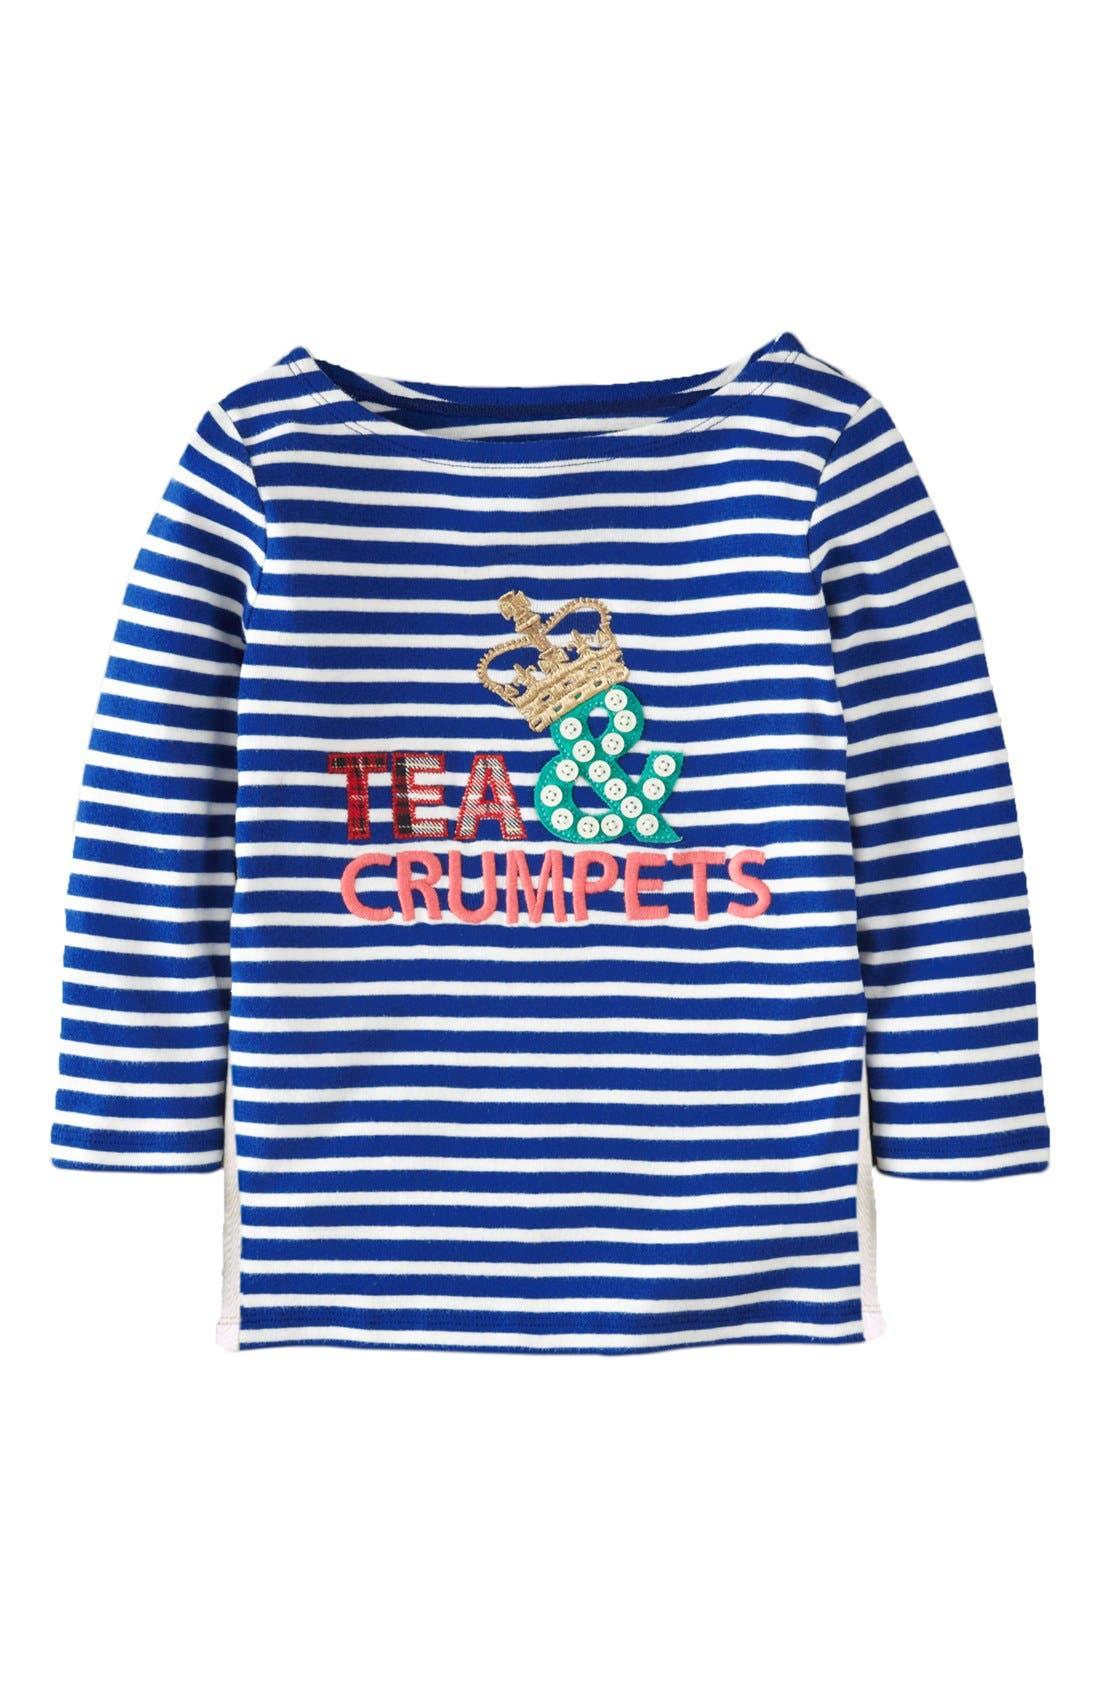 Alternate Image 1 Selected - Mini Boden 'Stripe Appliqué' Boatneck Tee (Little Girls & Big Girls)